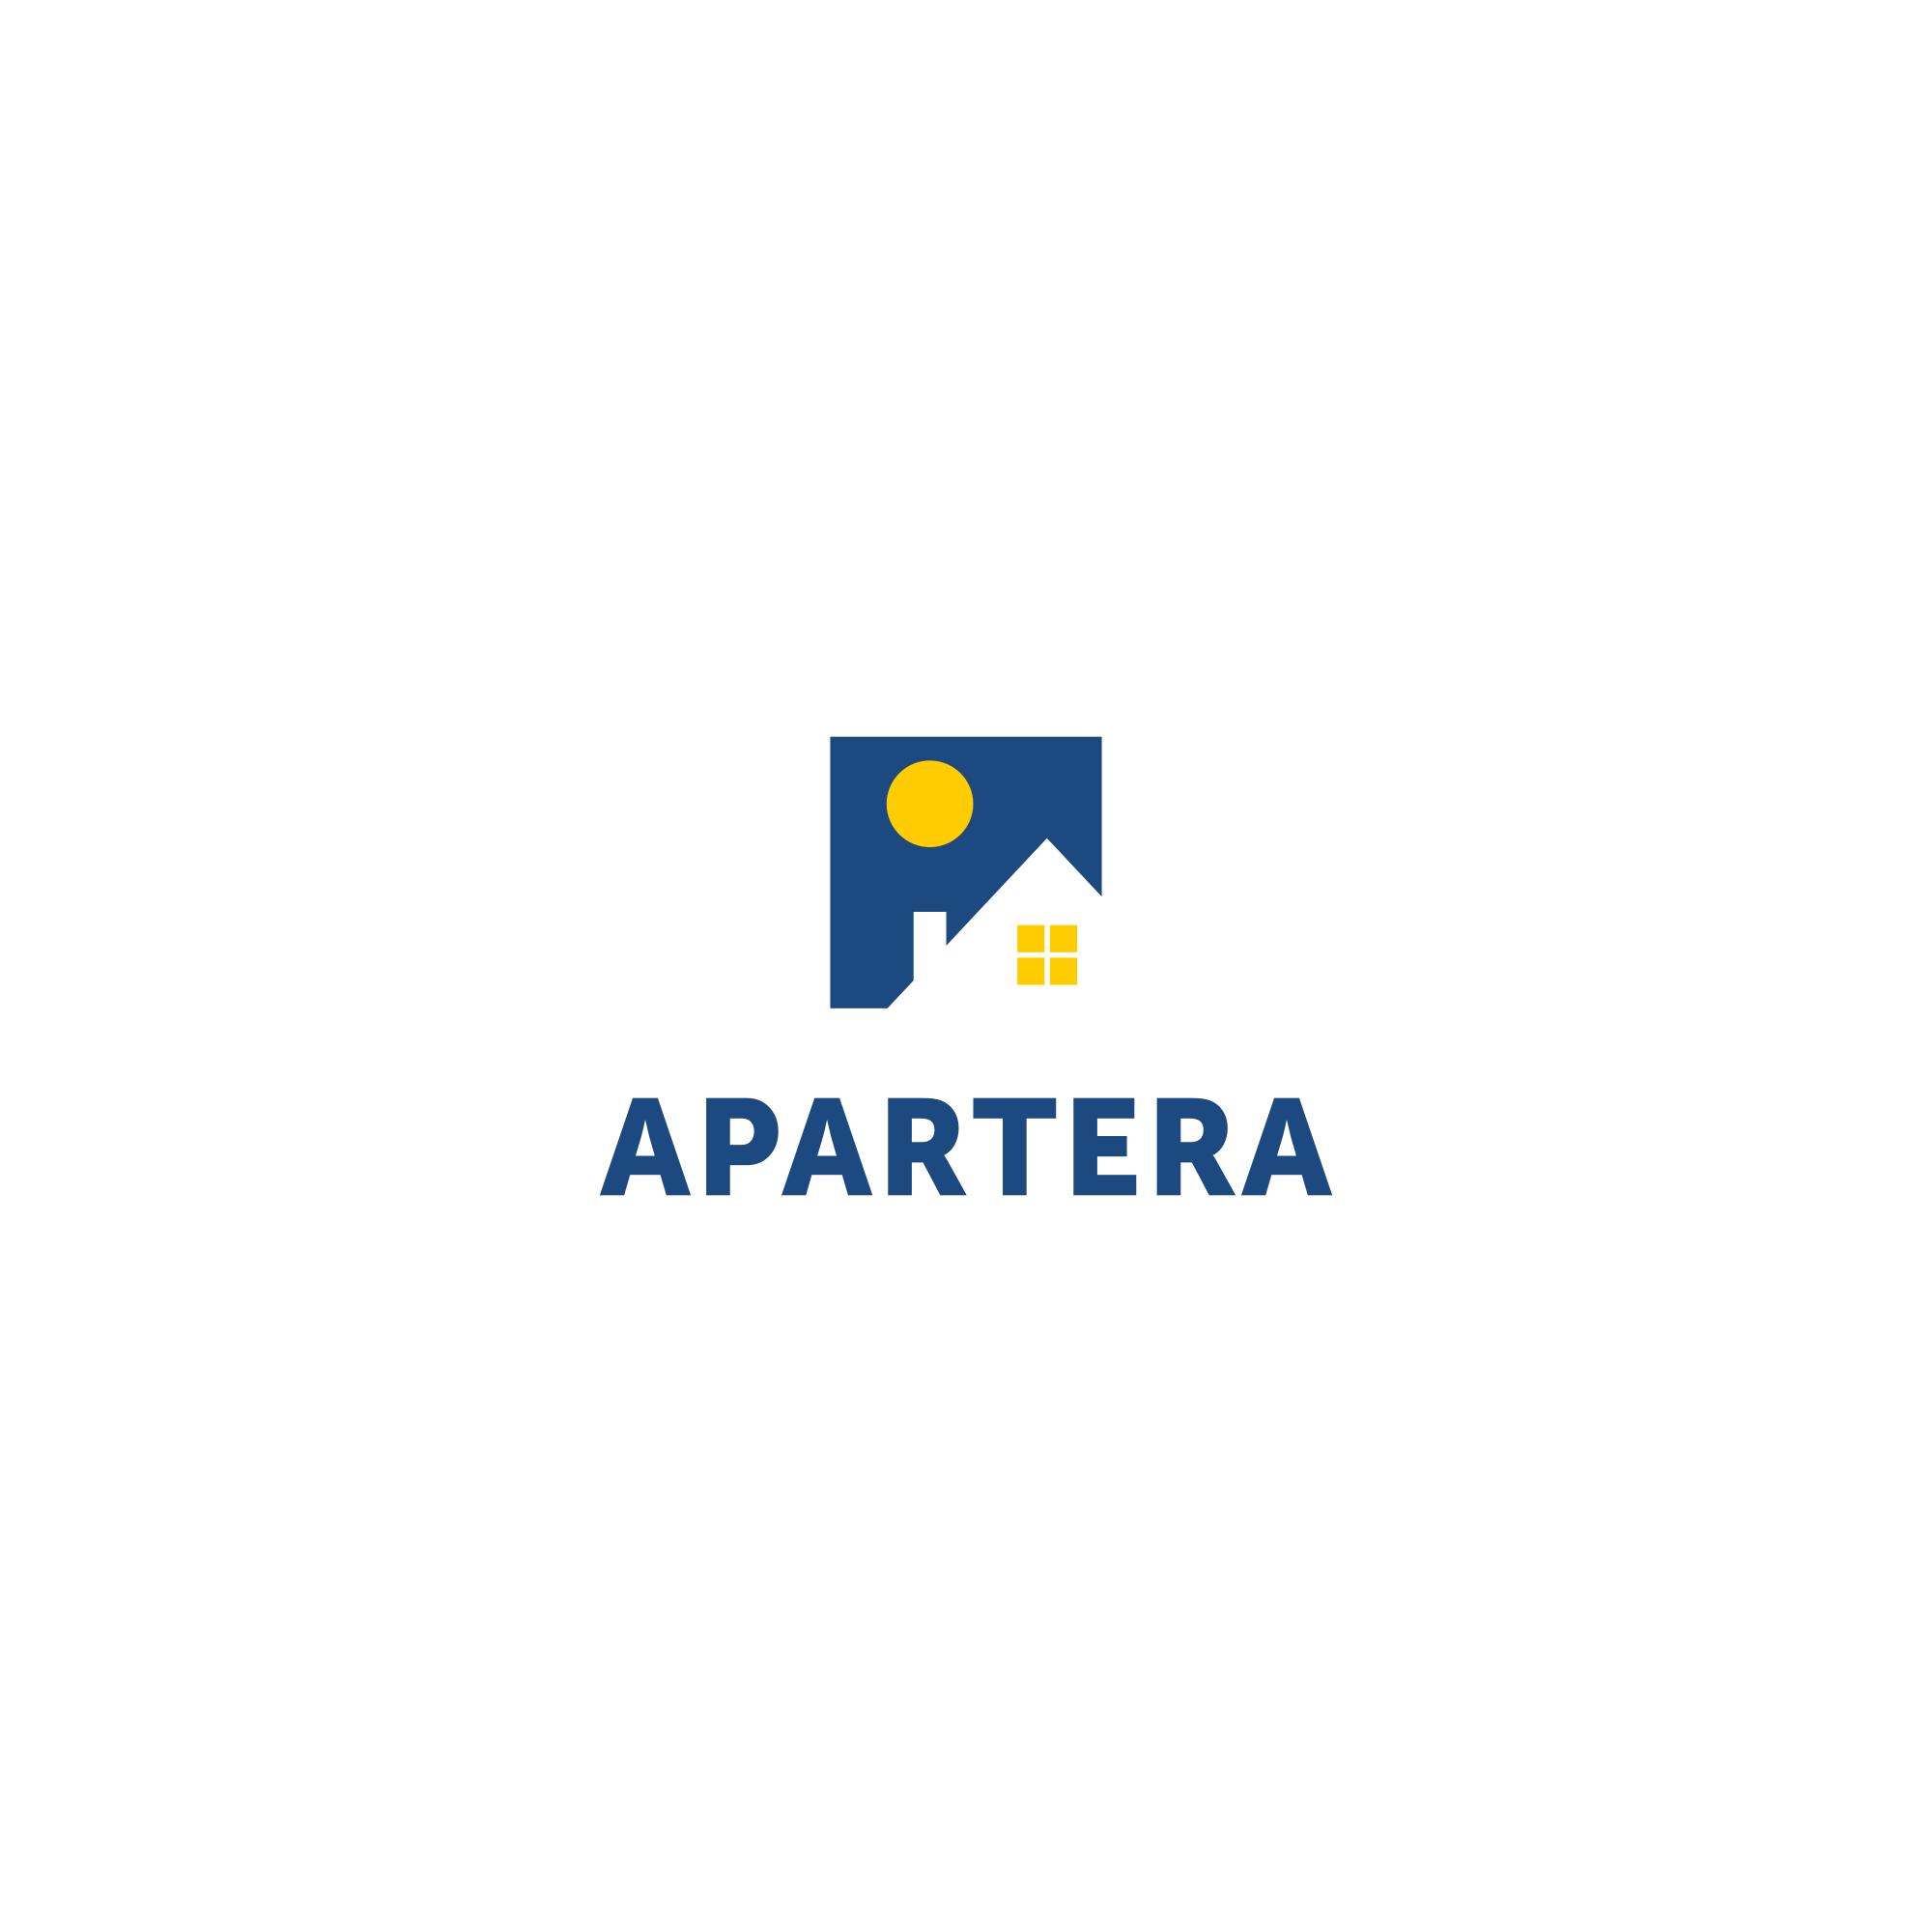 Логотип для управляющей компании  фото f_4445b74941c77410.png